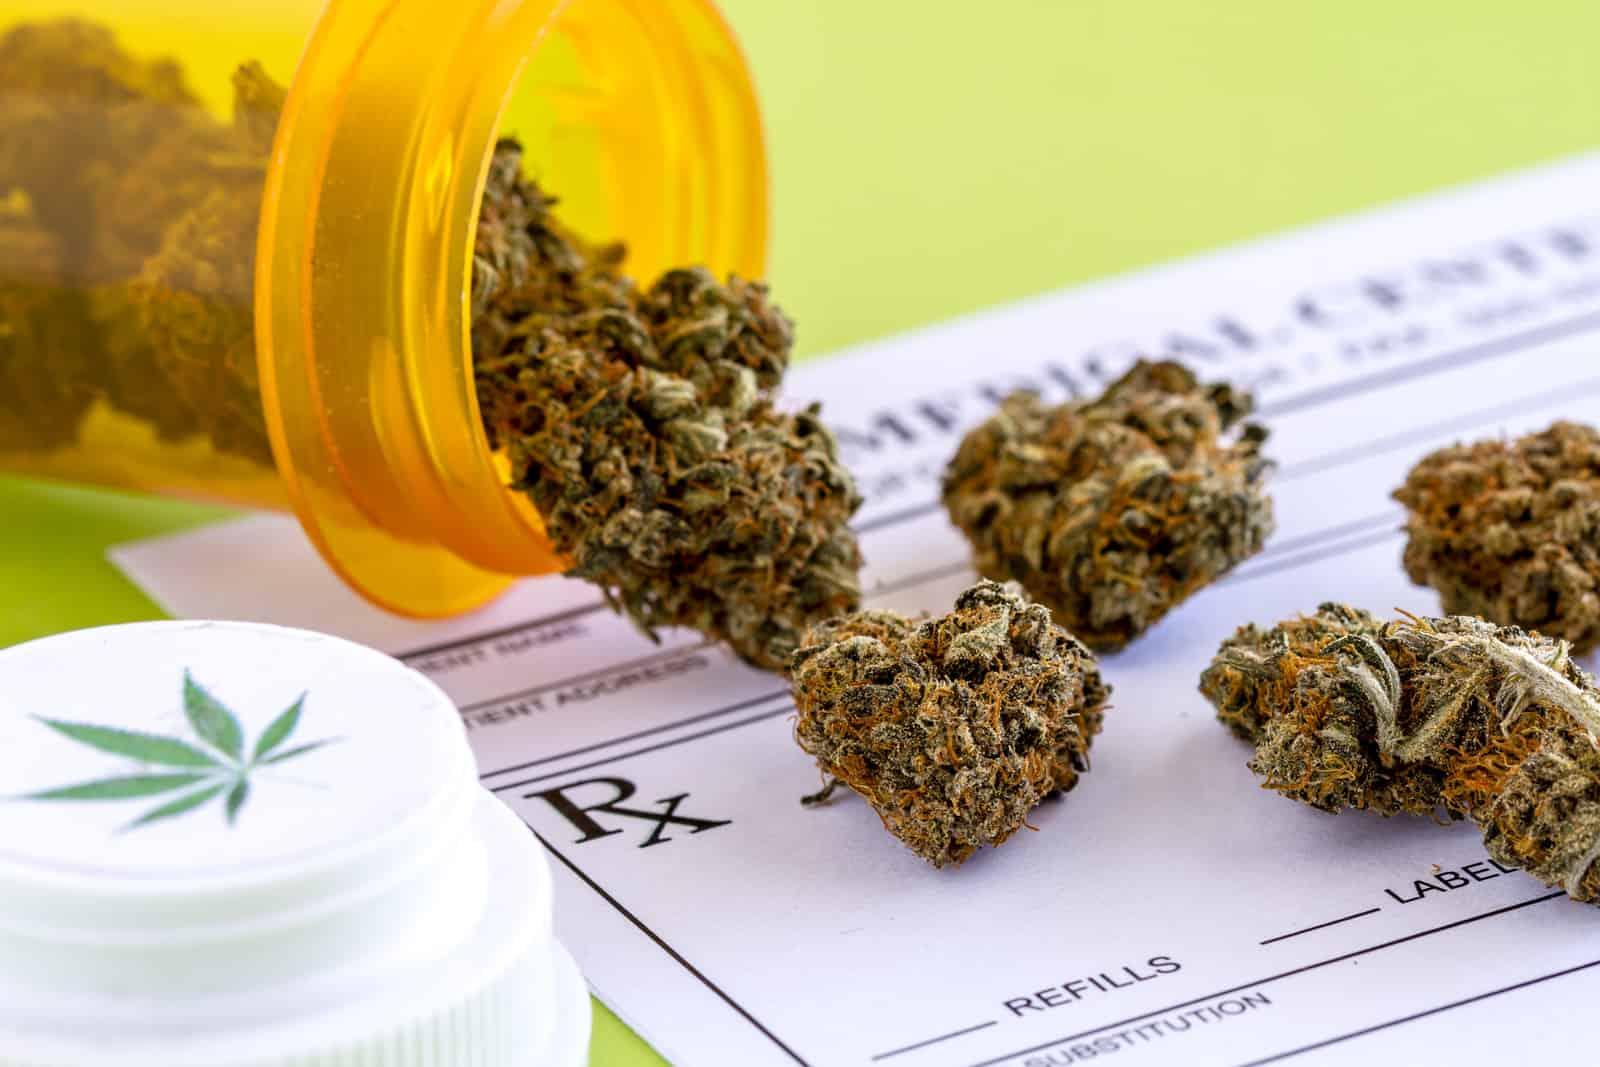 Cannabis marijuana training courses. Marijuana buds in a prescription bottle.